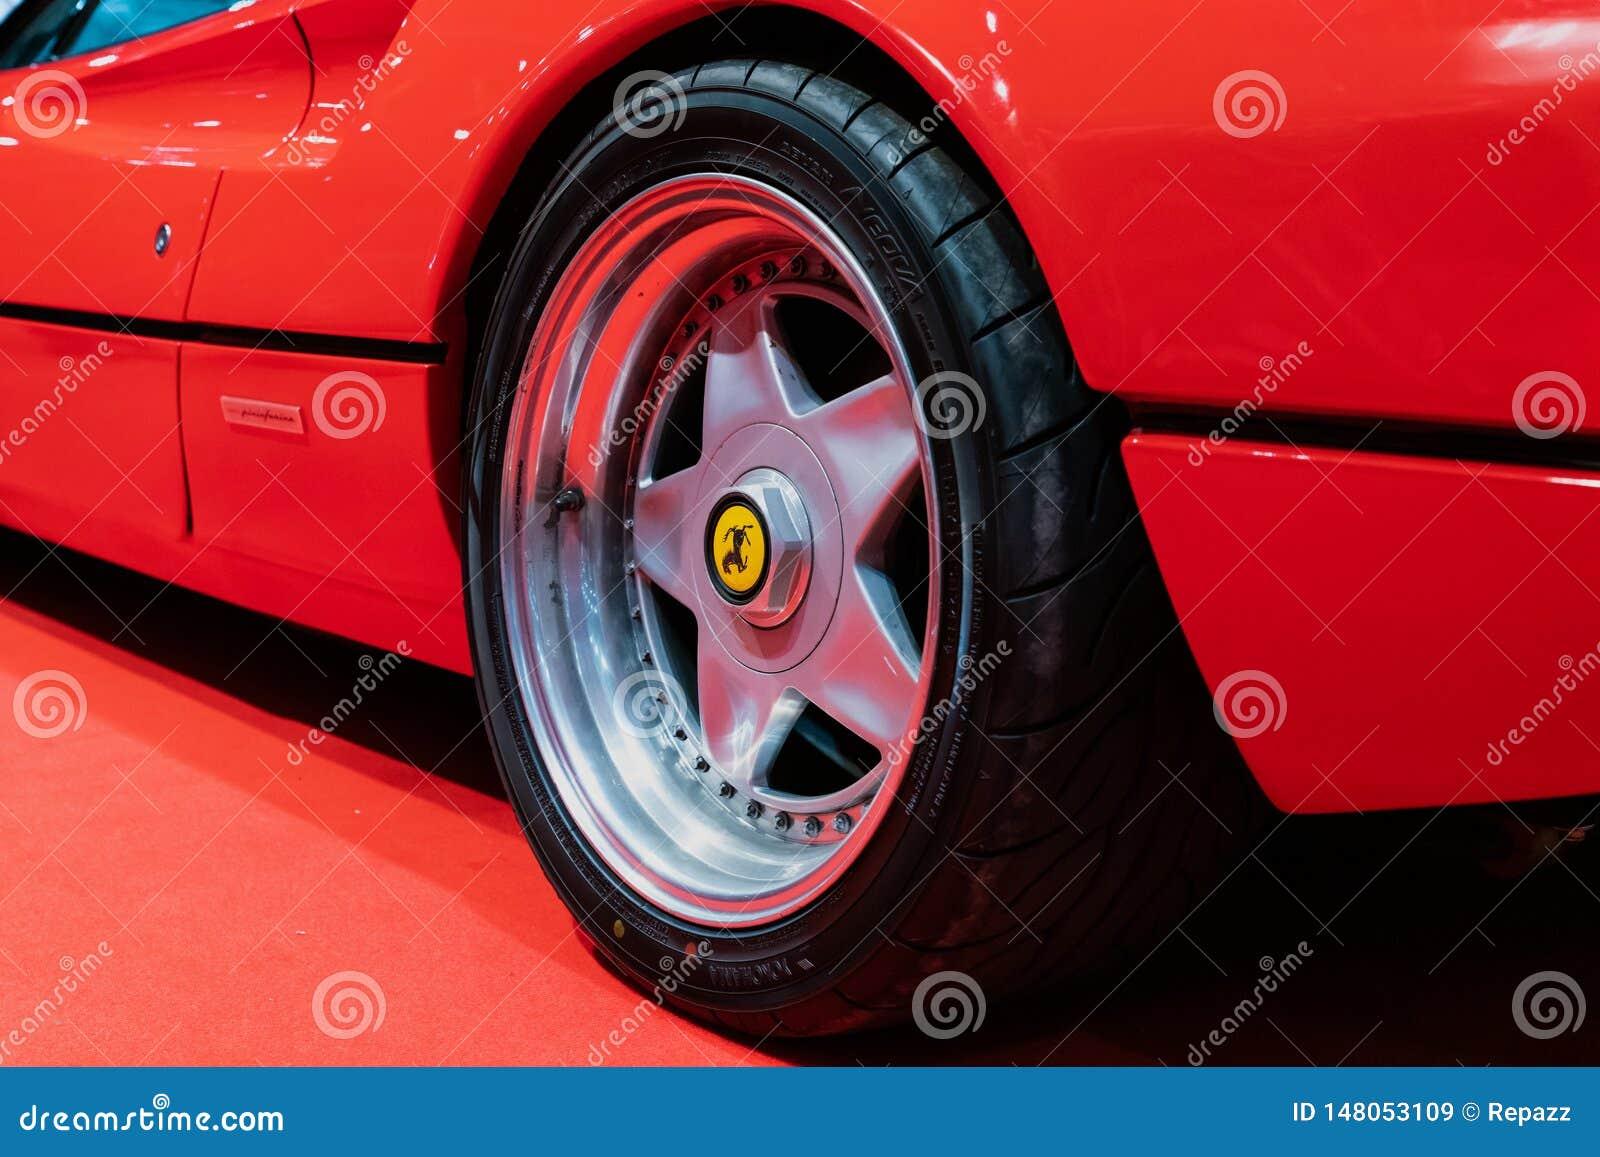 Speedline Alloy Wheels On Ferrari 308 Editorial Stock Image Image Of Racing Auto 148053109